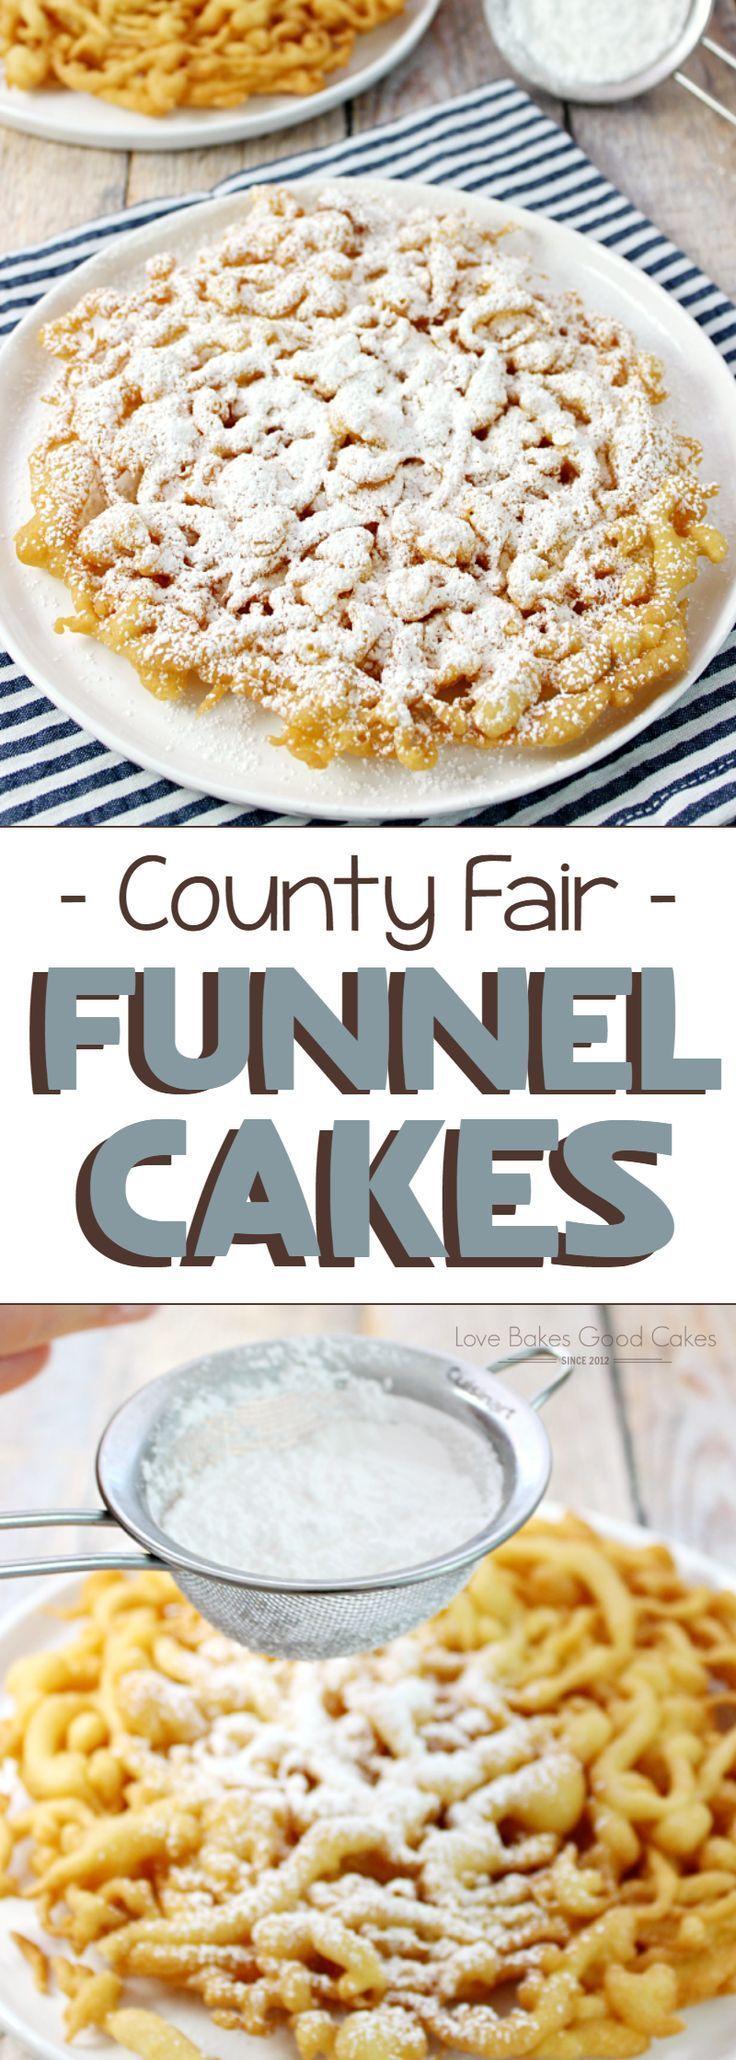 County fair funnel cakes recipe fair food recipes